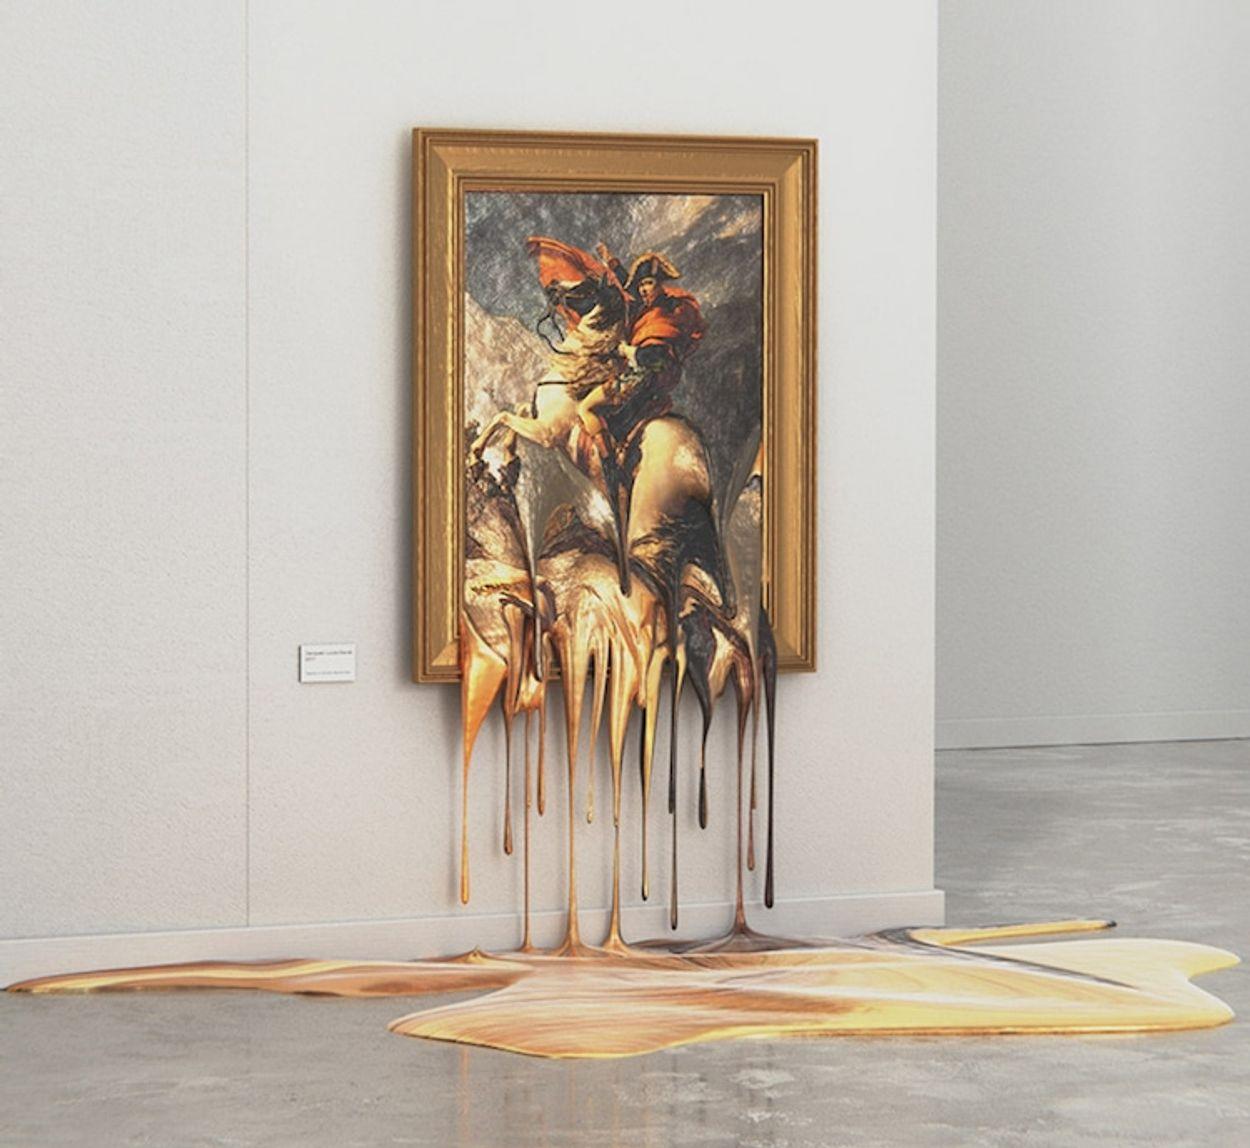 melting-masterpieces-digital-art-alper-dostal-5